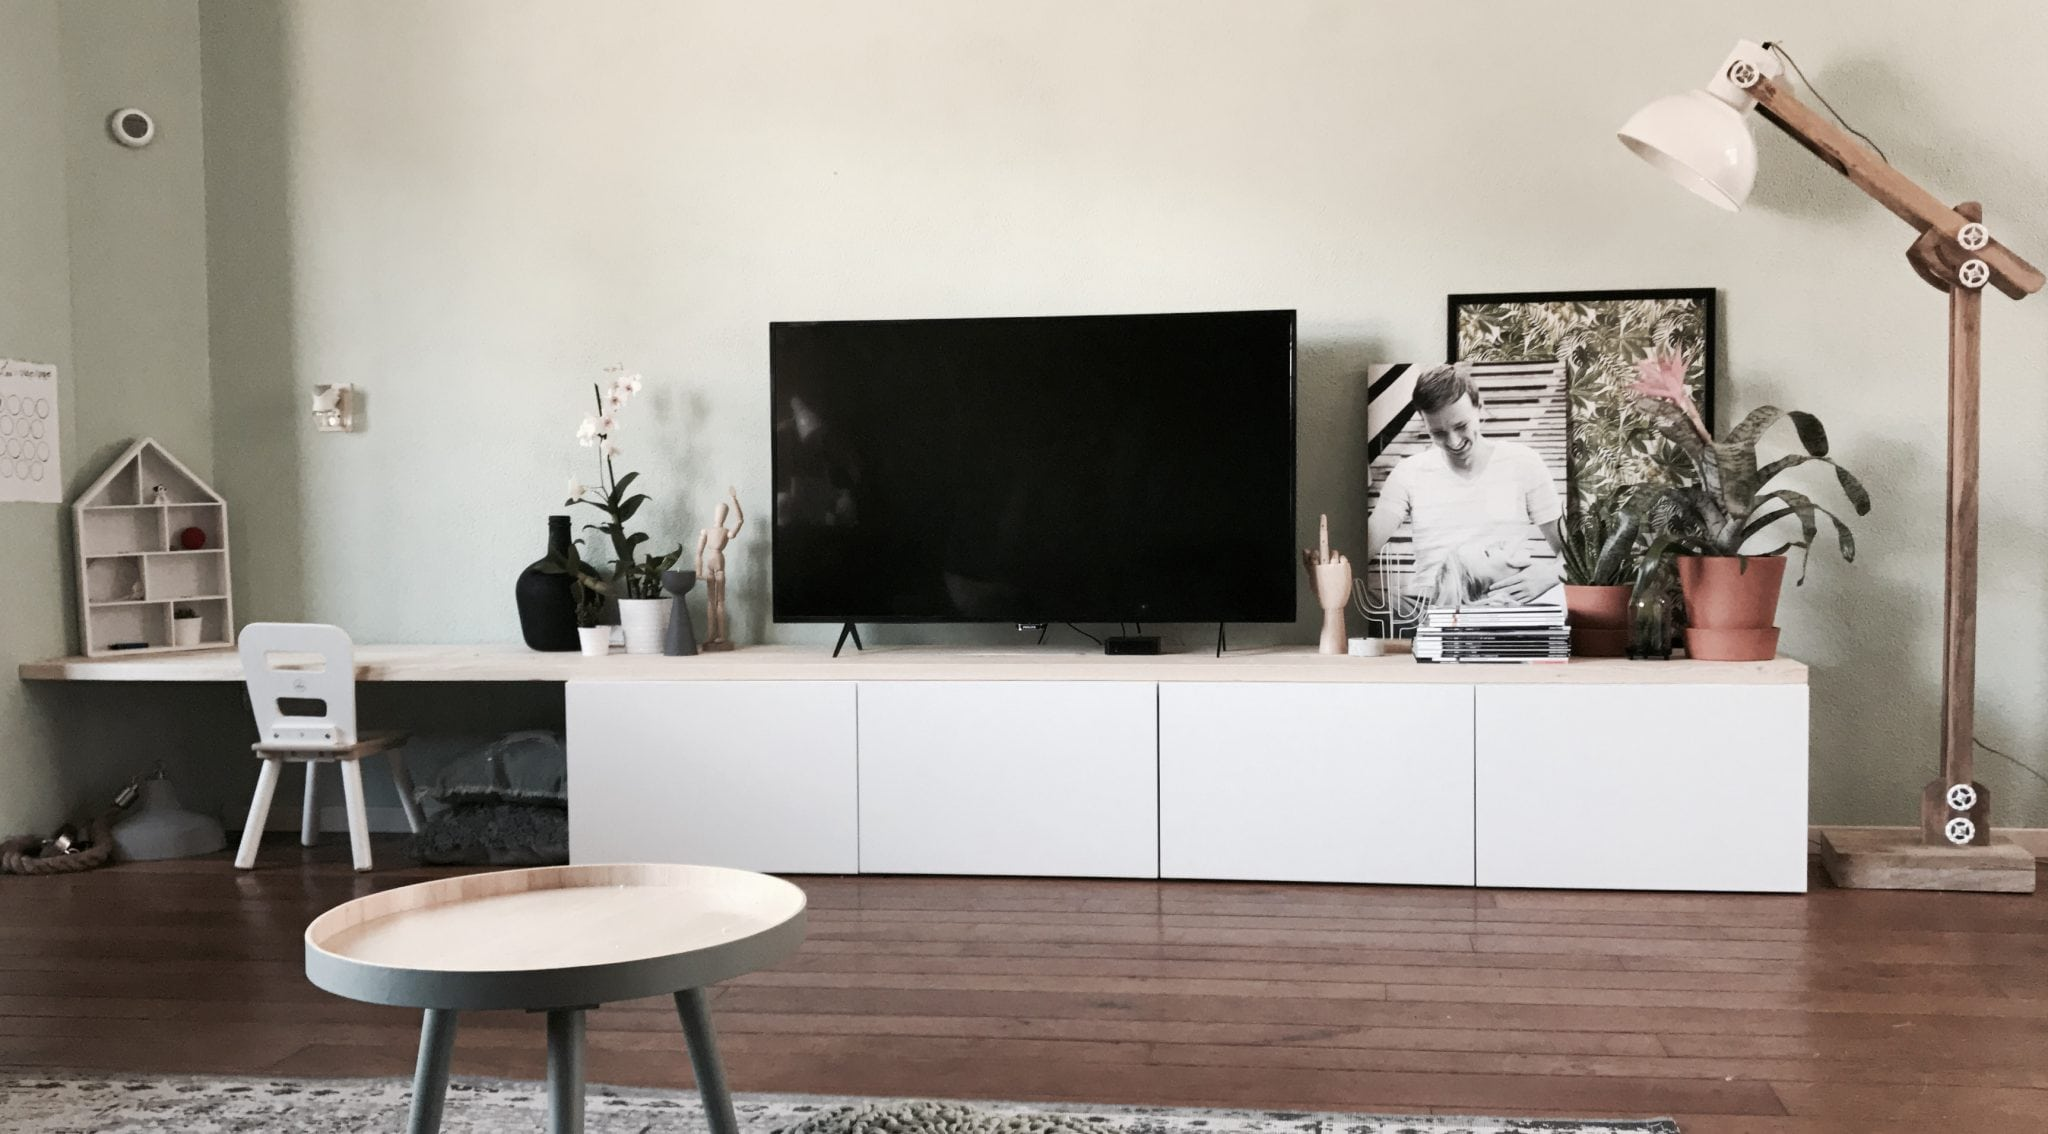 Ikea besta hack ikea besta 2 in 1 zitbank tv meubel for Besta fotos